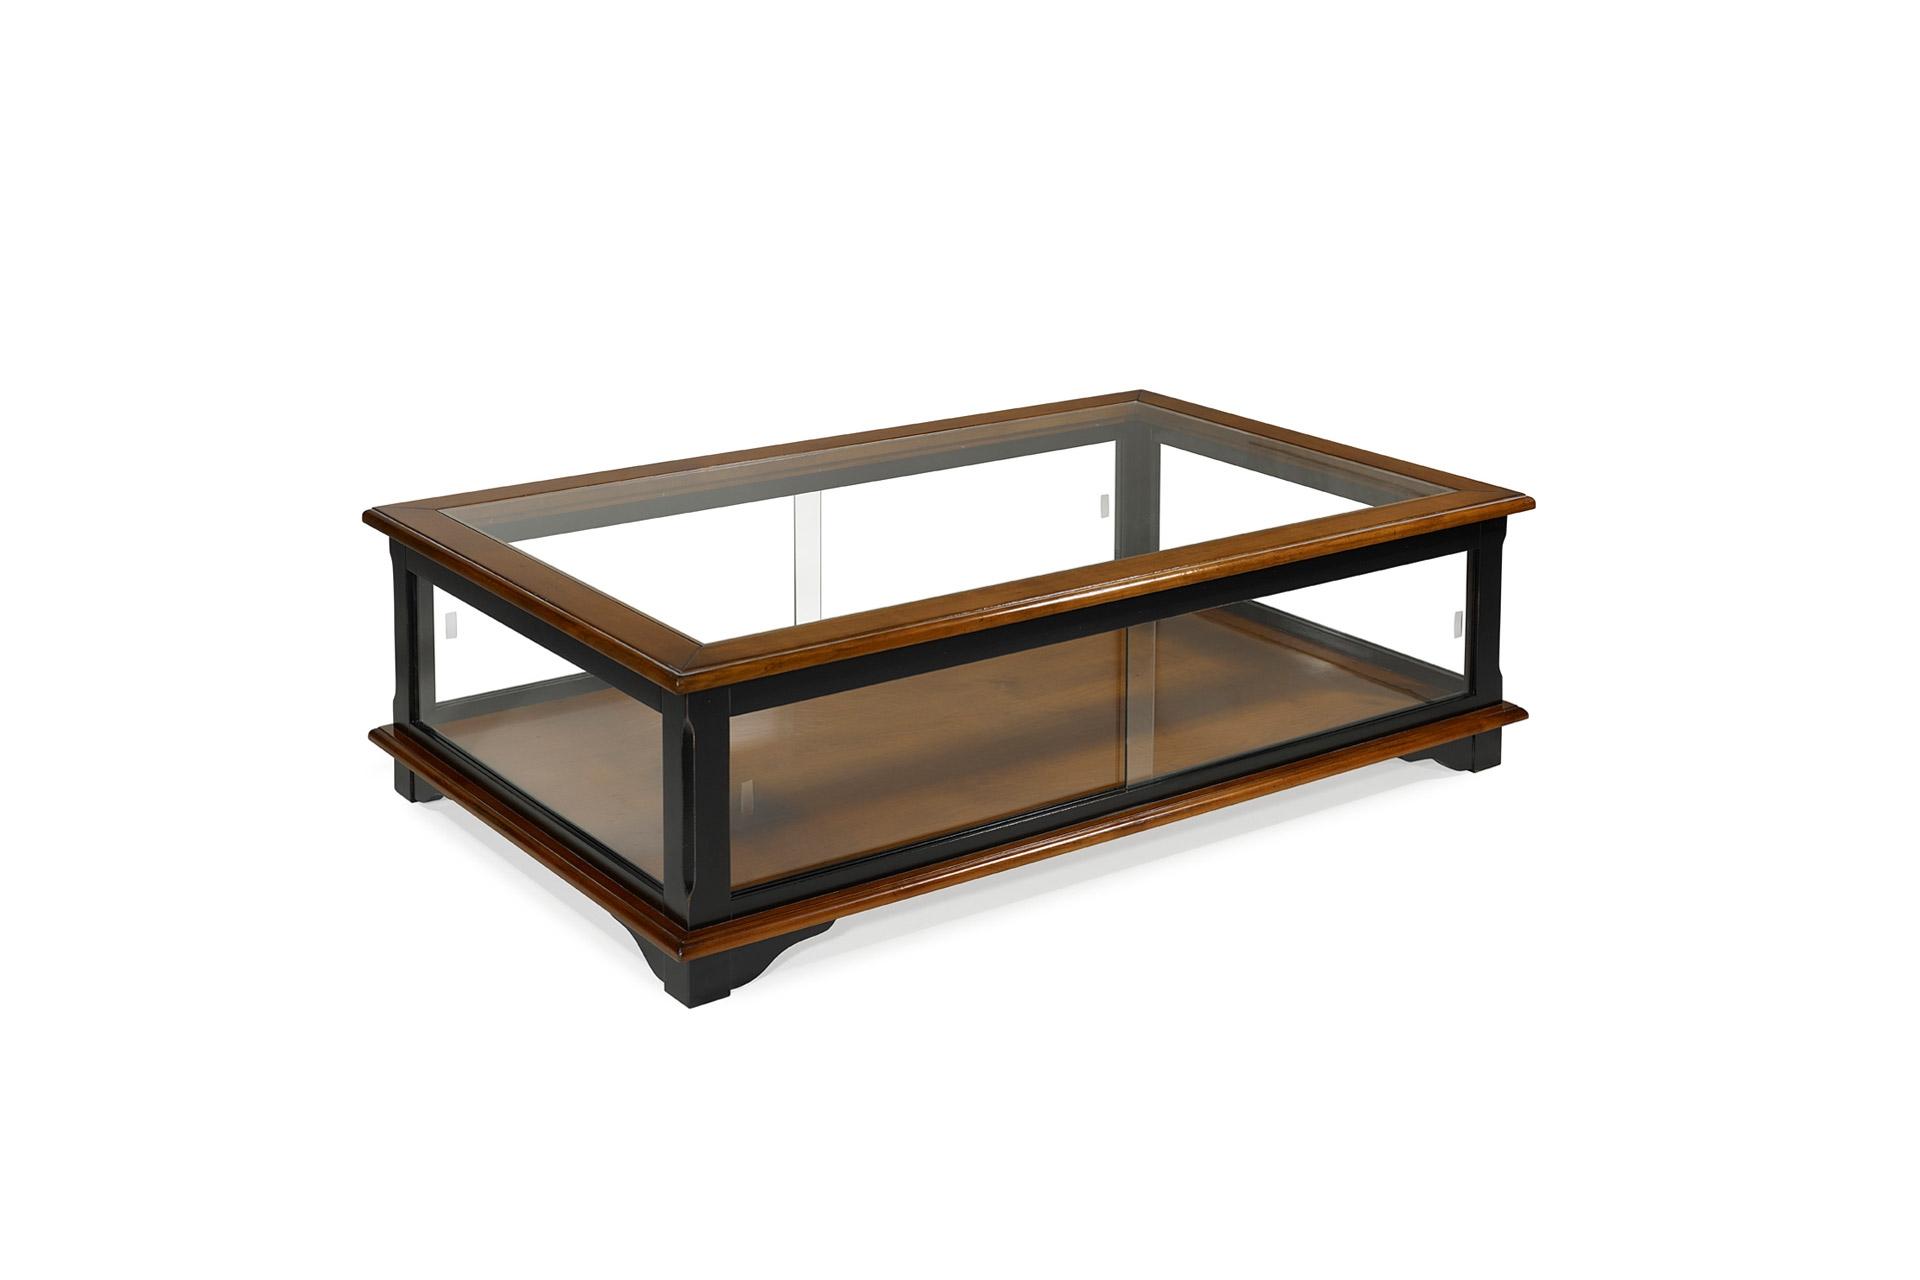 La rochelle glass coffee table coffee tables - La table basque la rochelle ...